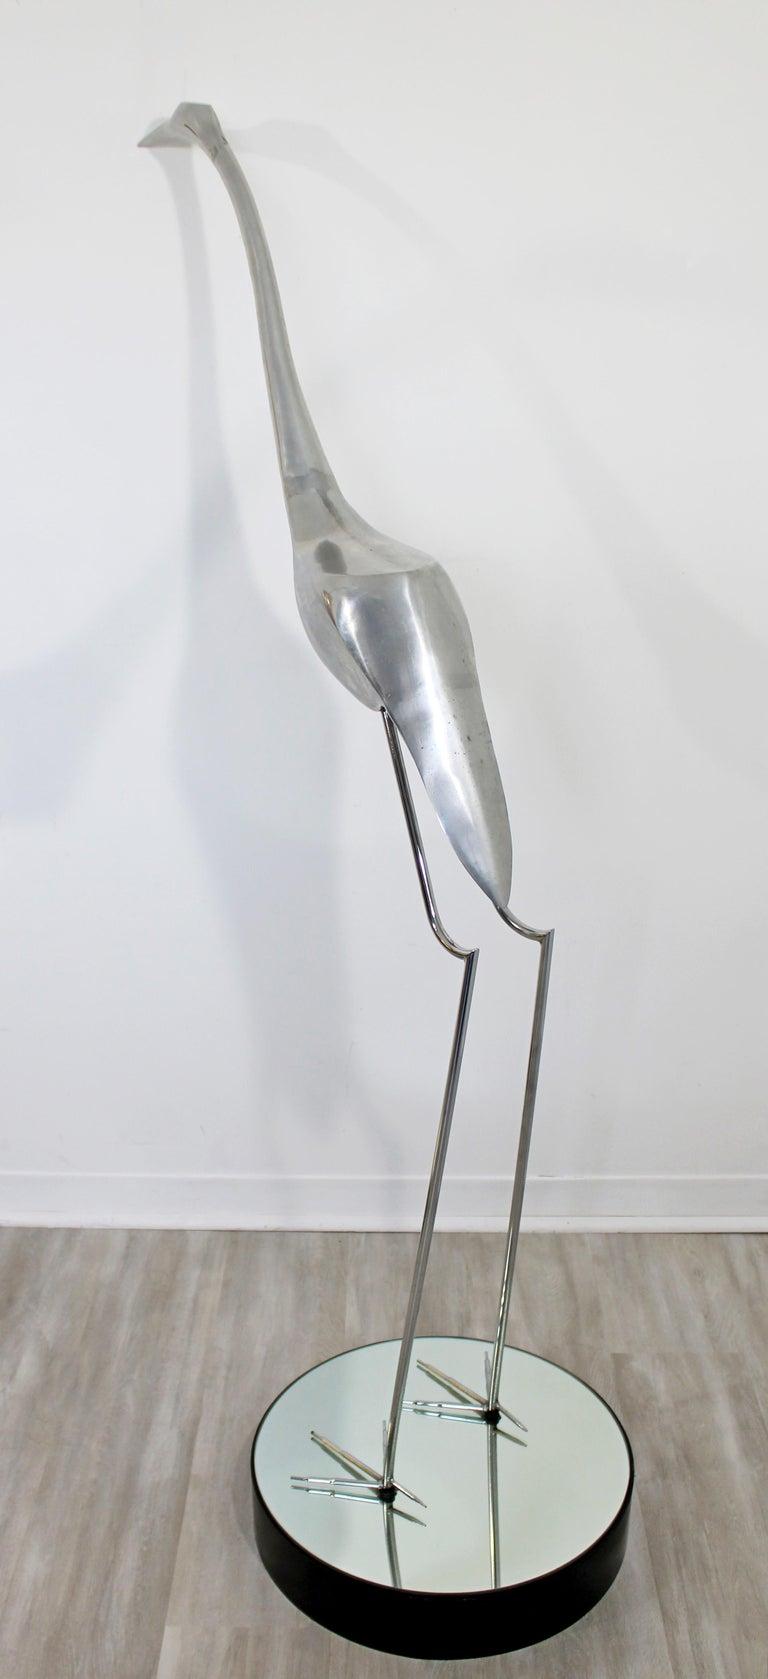 American Mid-Century Modern Monumental Curtis Jere Chrome Heron Floor Sculpture, 1970s For Sale